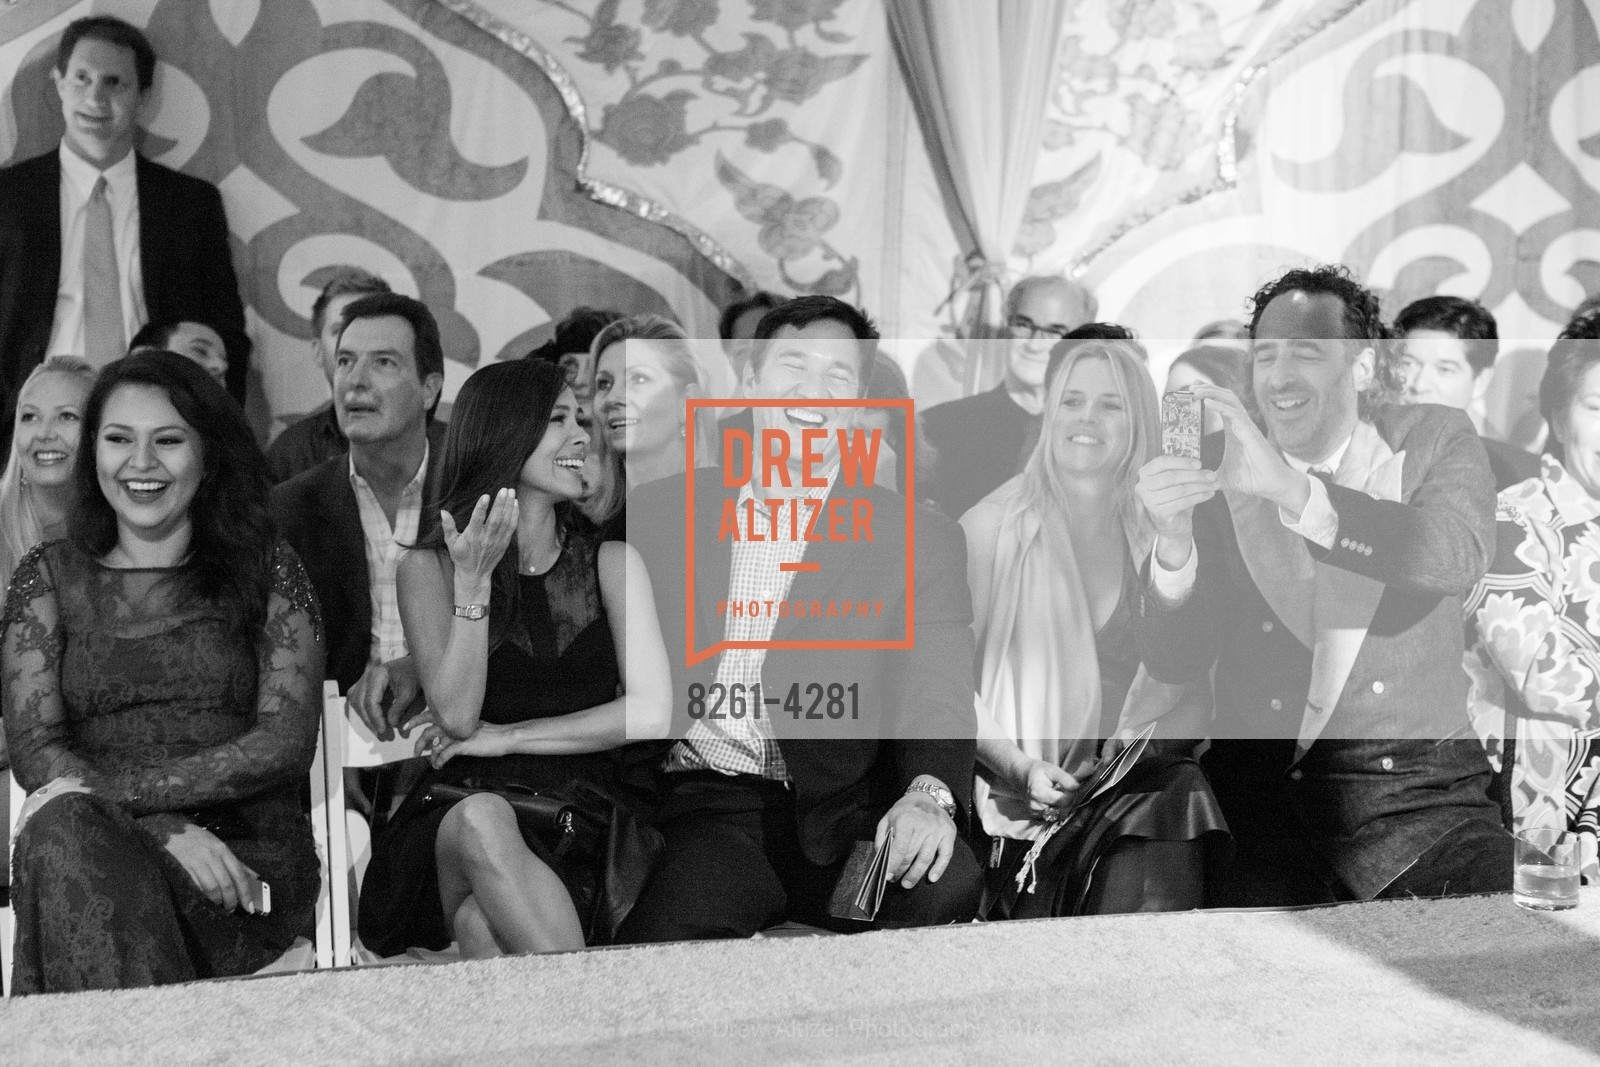 Grecia Garza, Kat Smith, Todd Chaffee, Jackie Curleigh, James Curleigh, Photo #8261-4281